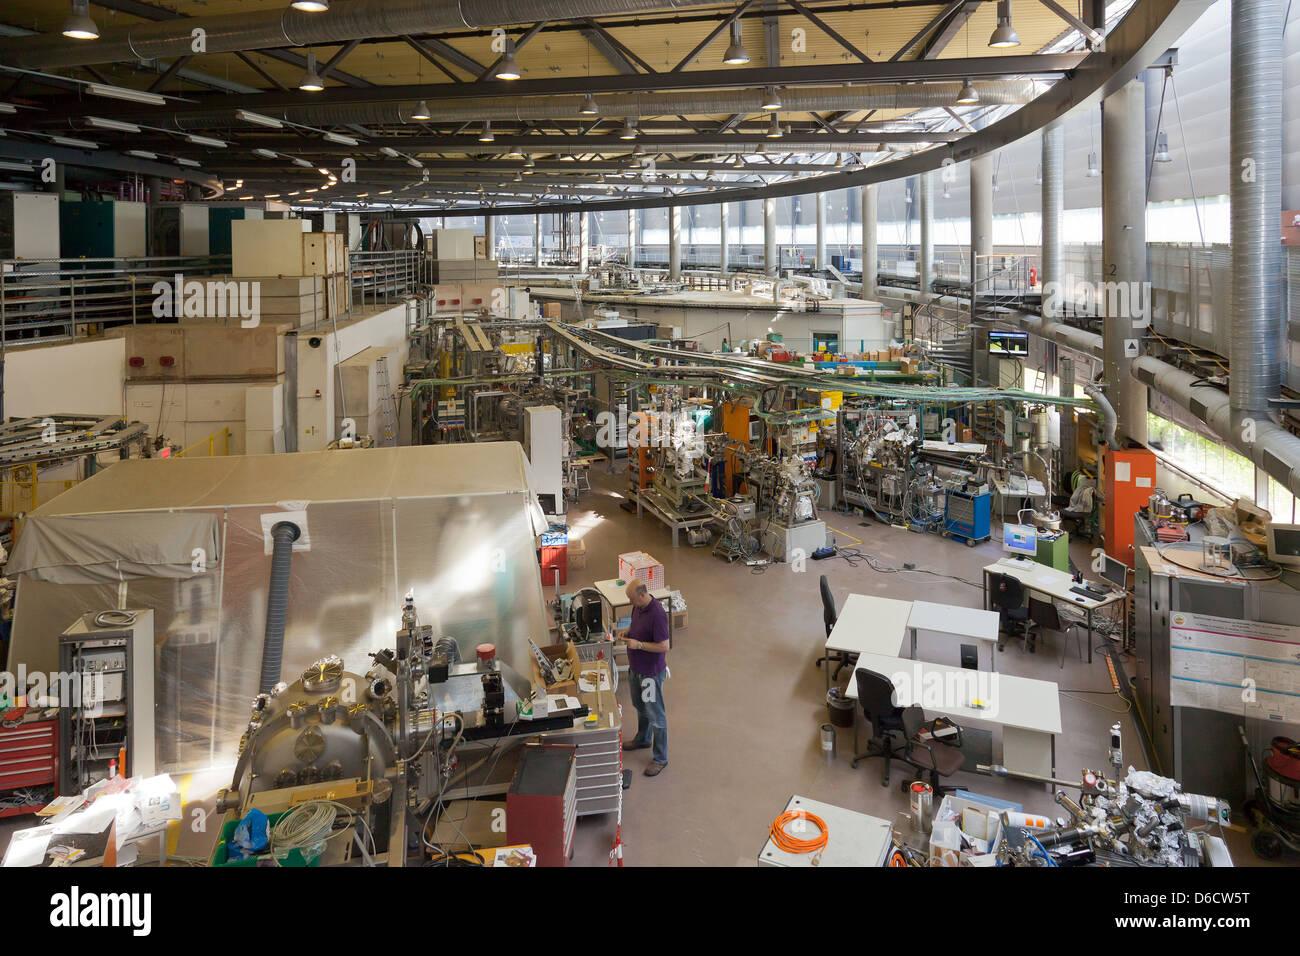 Berlin, Germany, Helmholtz-Zentrum, Berlin electron storage ring company for synchrotron BESSY II - Stock Image